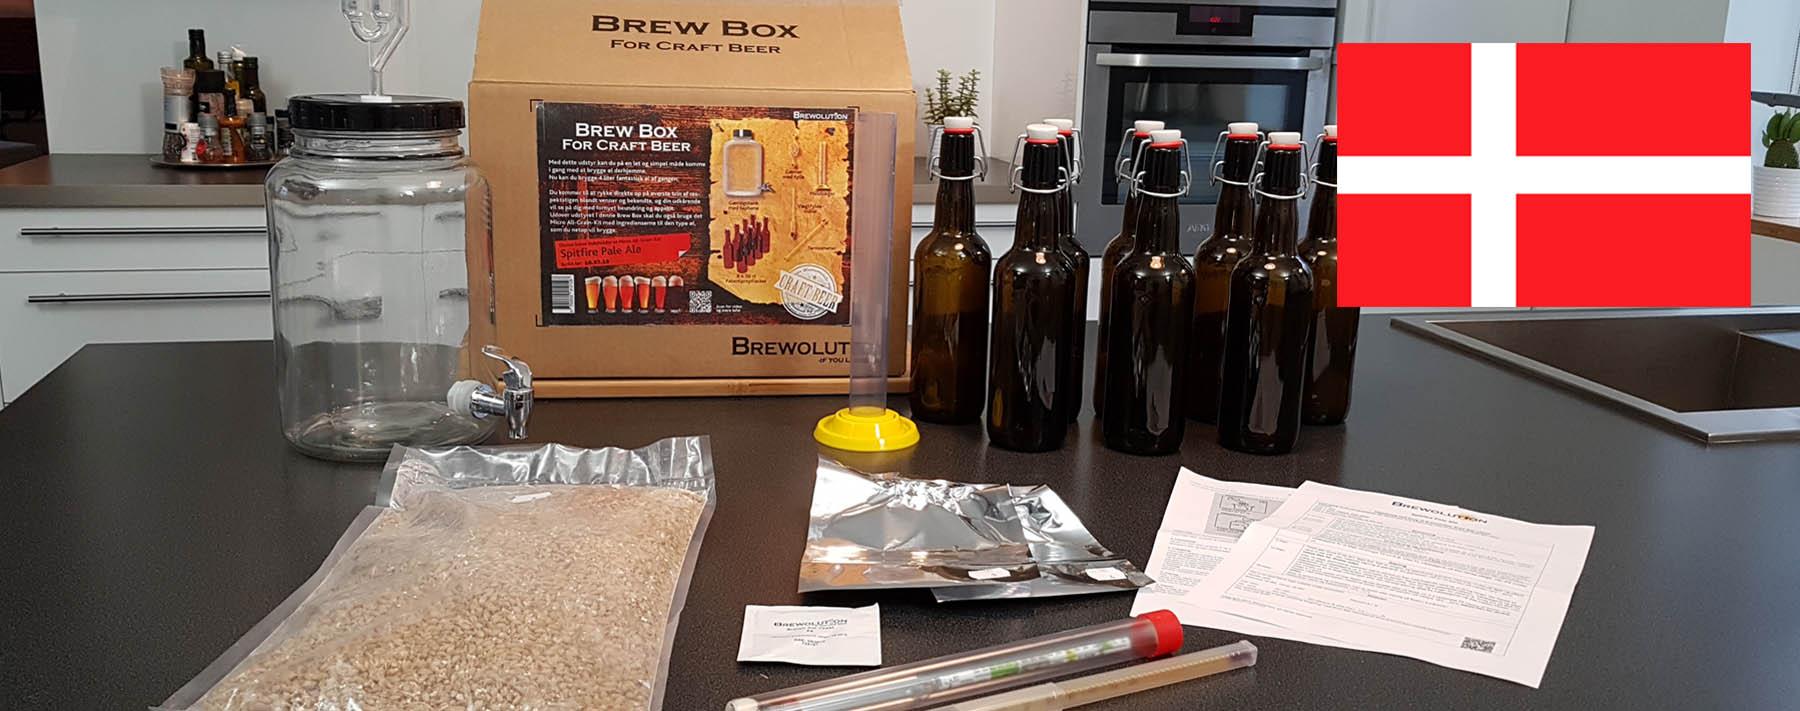 DK Guides Brew Box